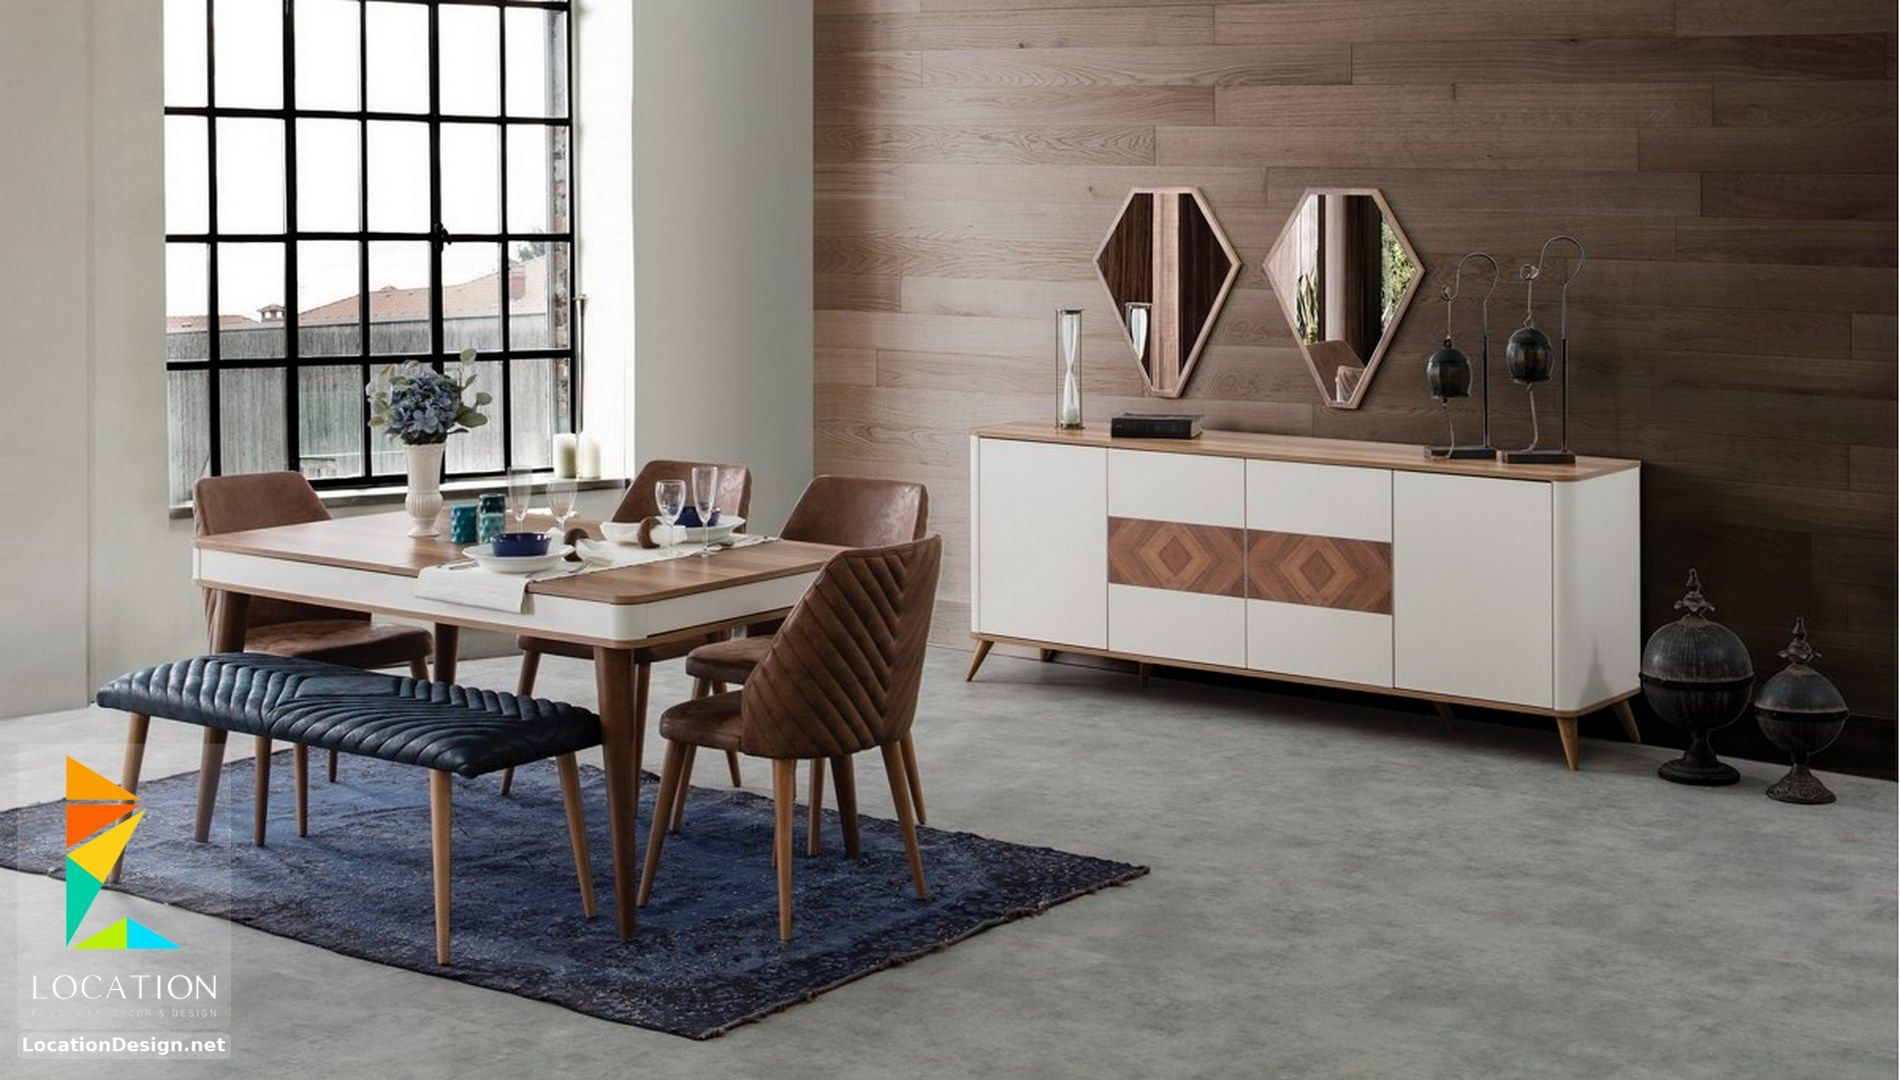 غرف سفرة مودرن كاملة باشيك واحدث تصميمات والوان متميزة Living Dining Room Farm House Living Room Wardrobe Furniture